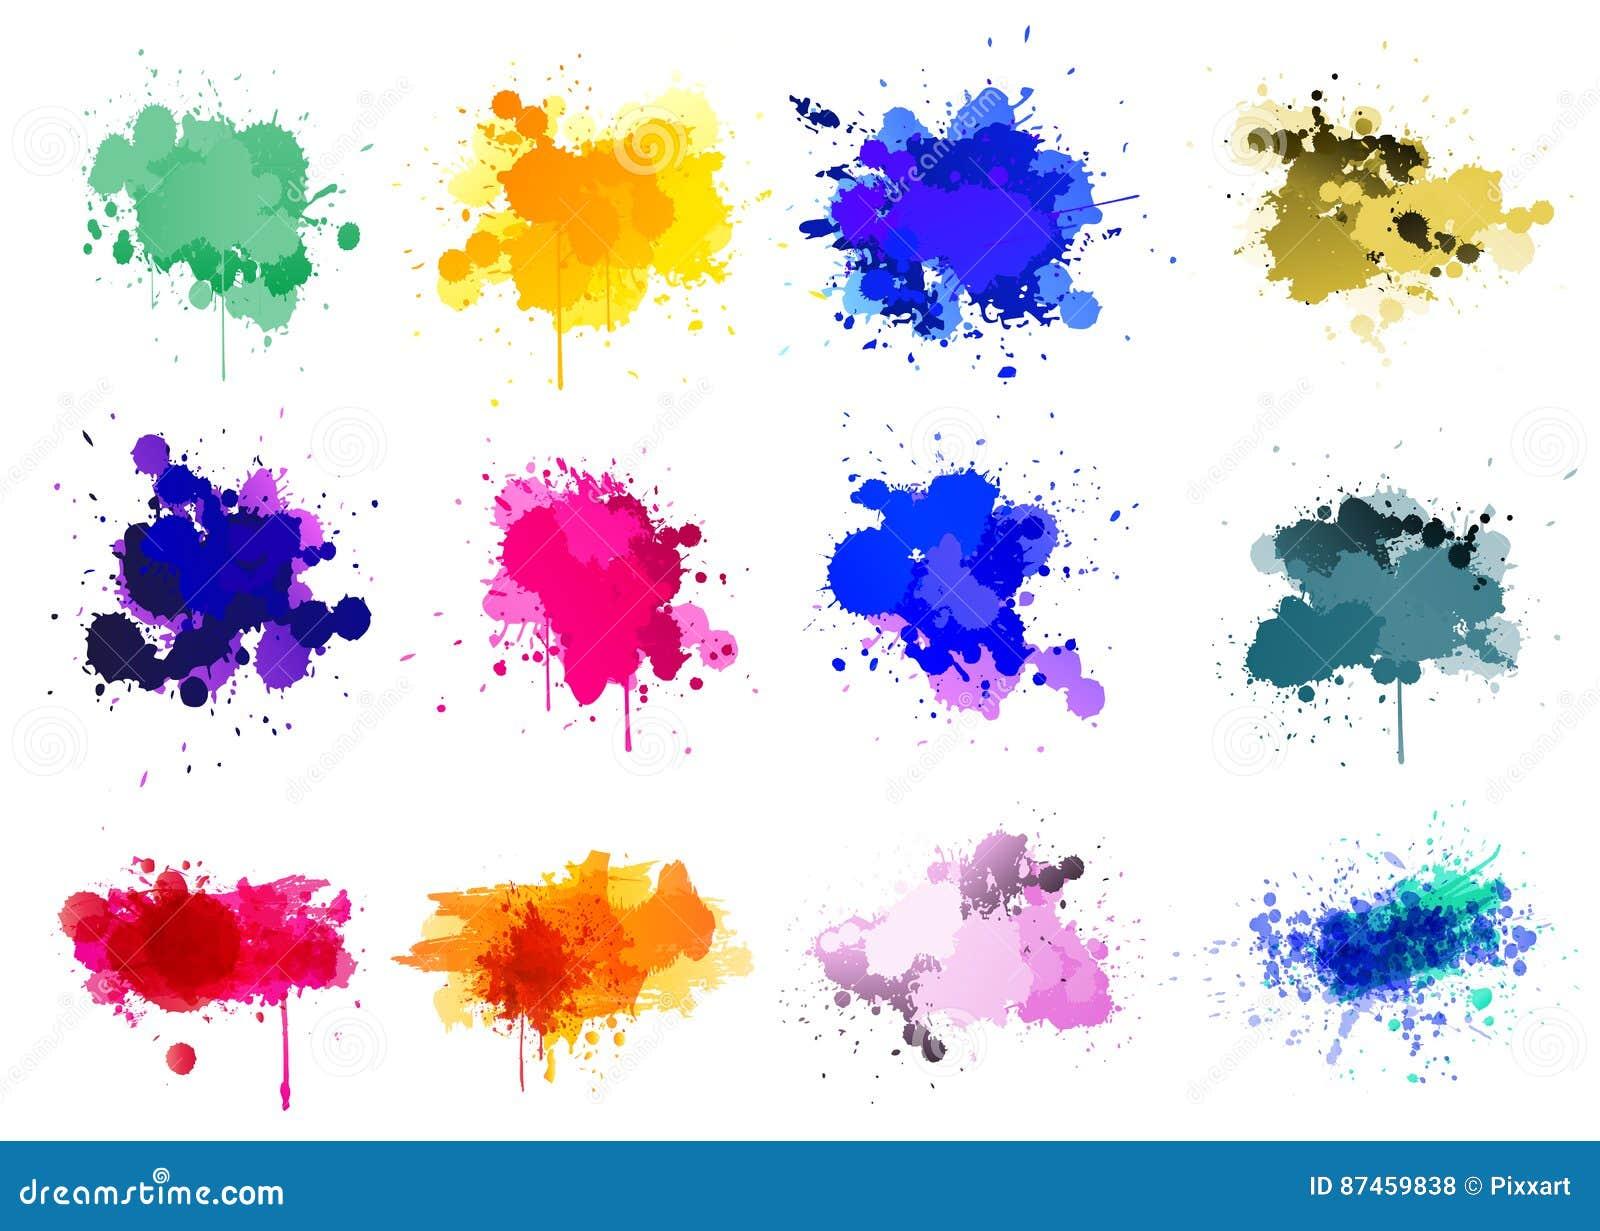 Colorful paint splatters - set of 12